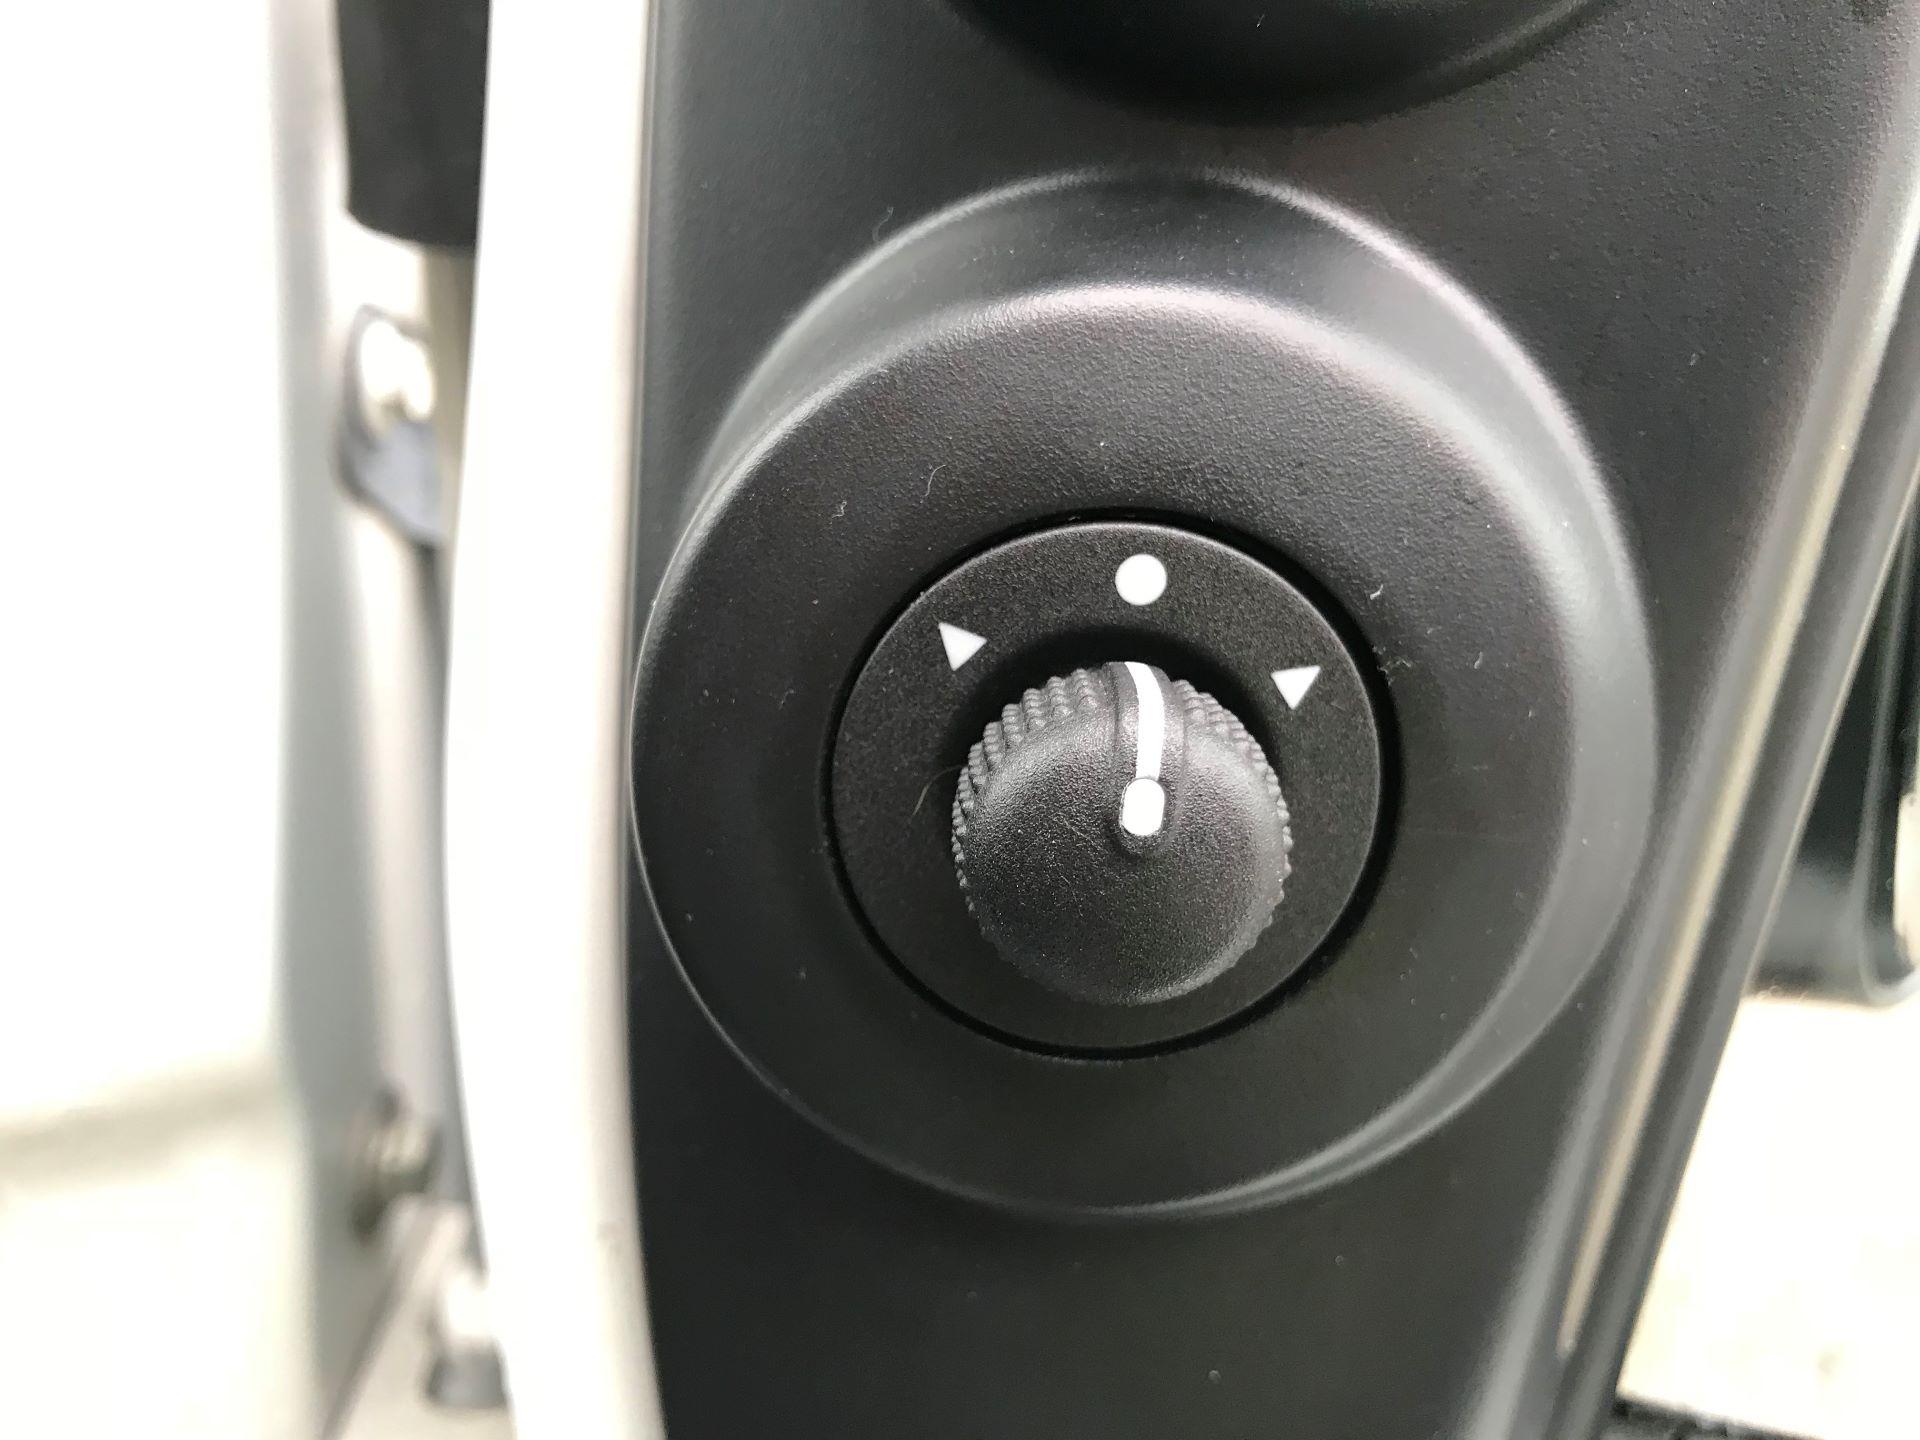 2016 Peugeot Bipper 1.3 HDI 75 S PLUS PACK NON S/S EURO 5 (NU16DLJ) Image 21